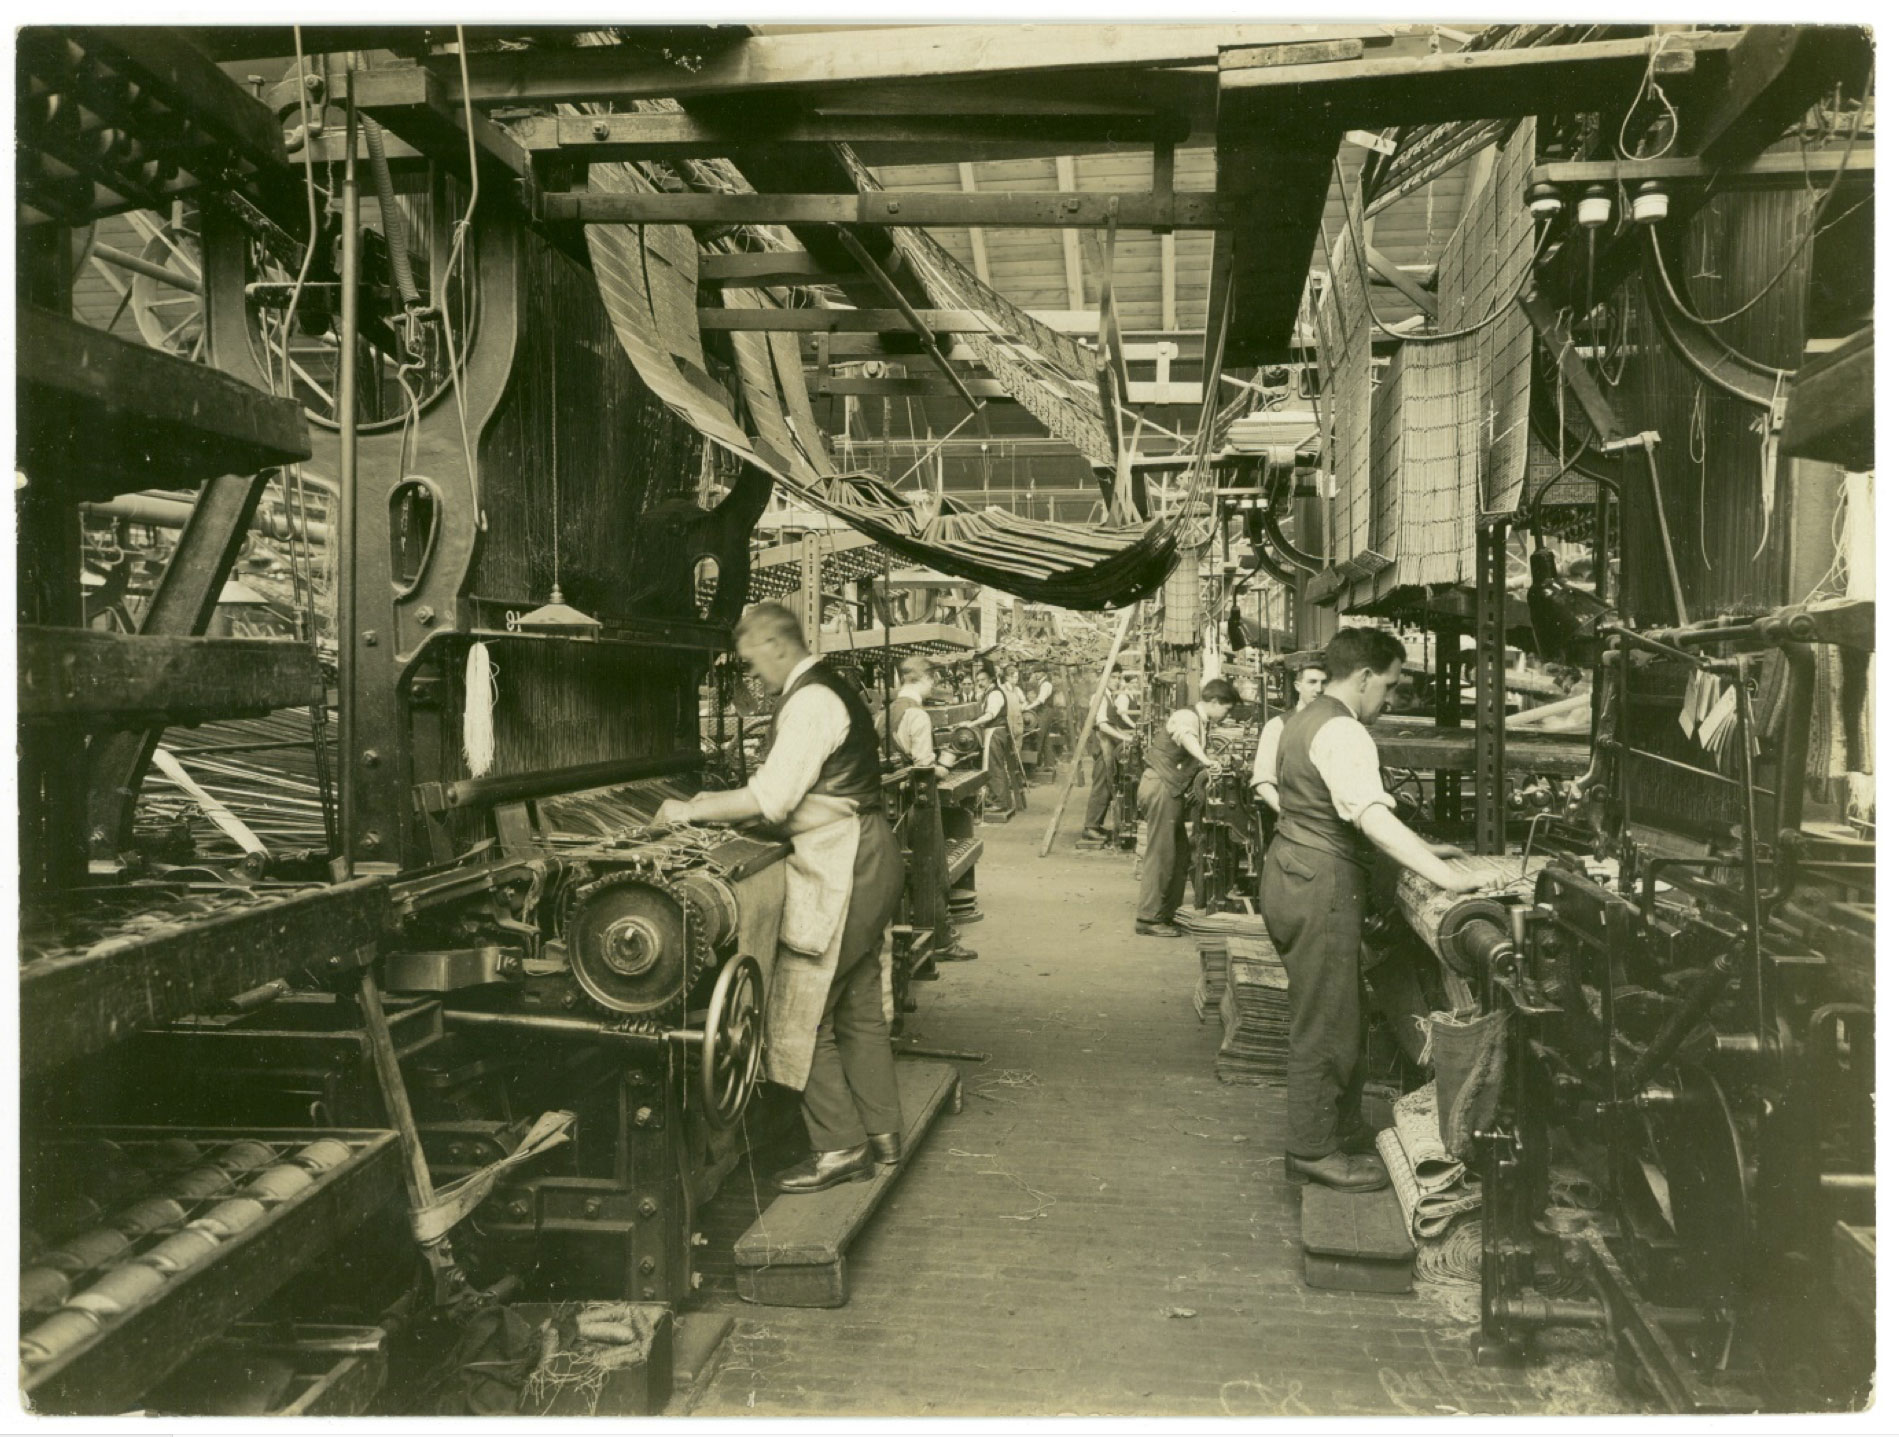 Newcomen Society - Jacquard Weaving, Carpet Trades 1923